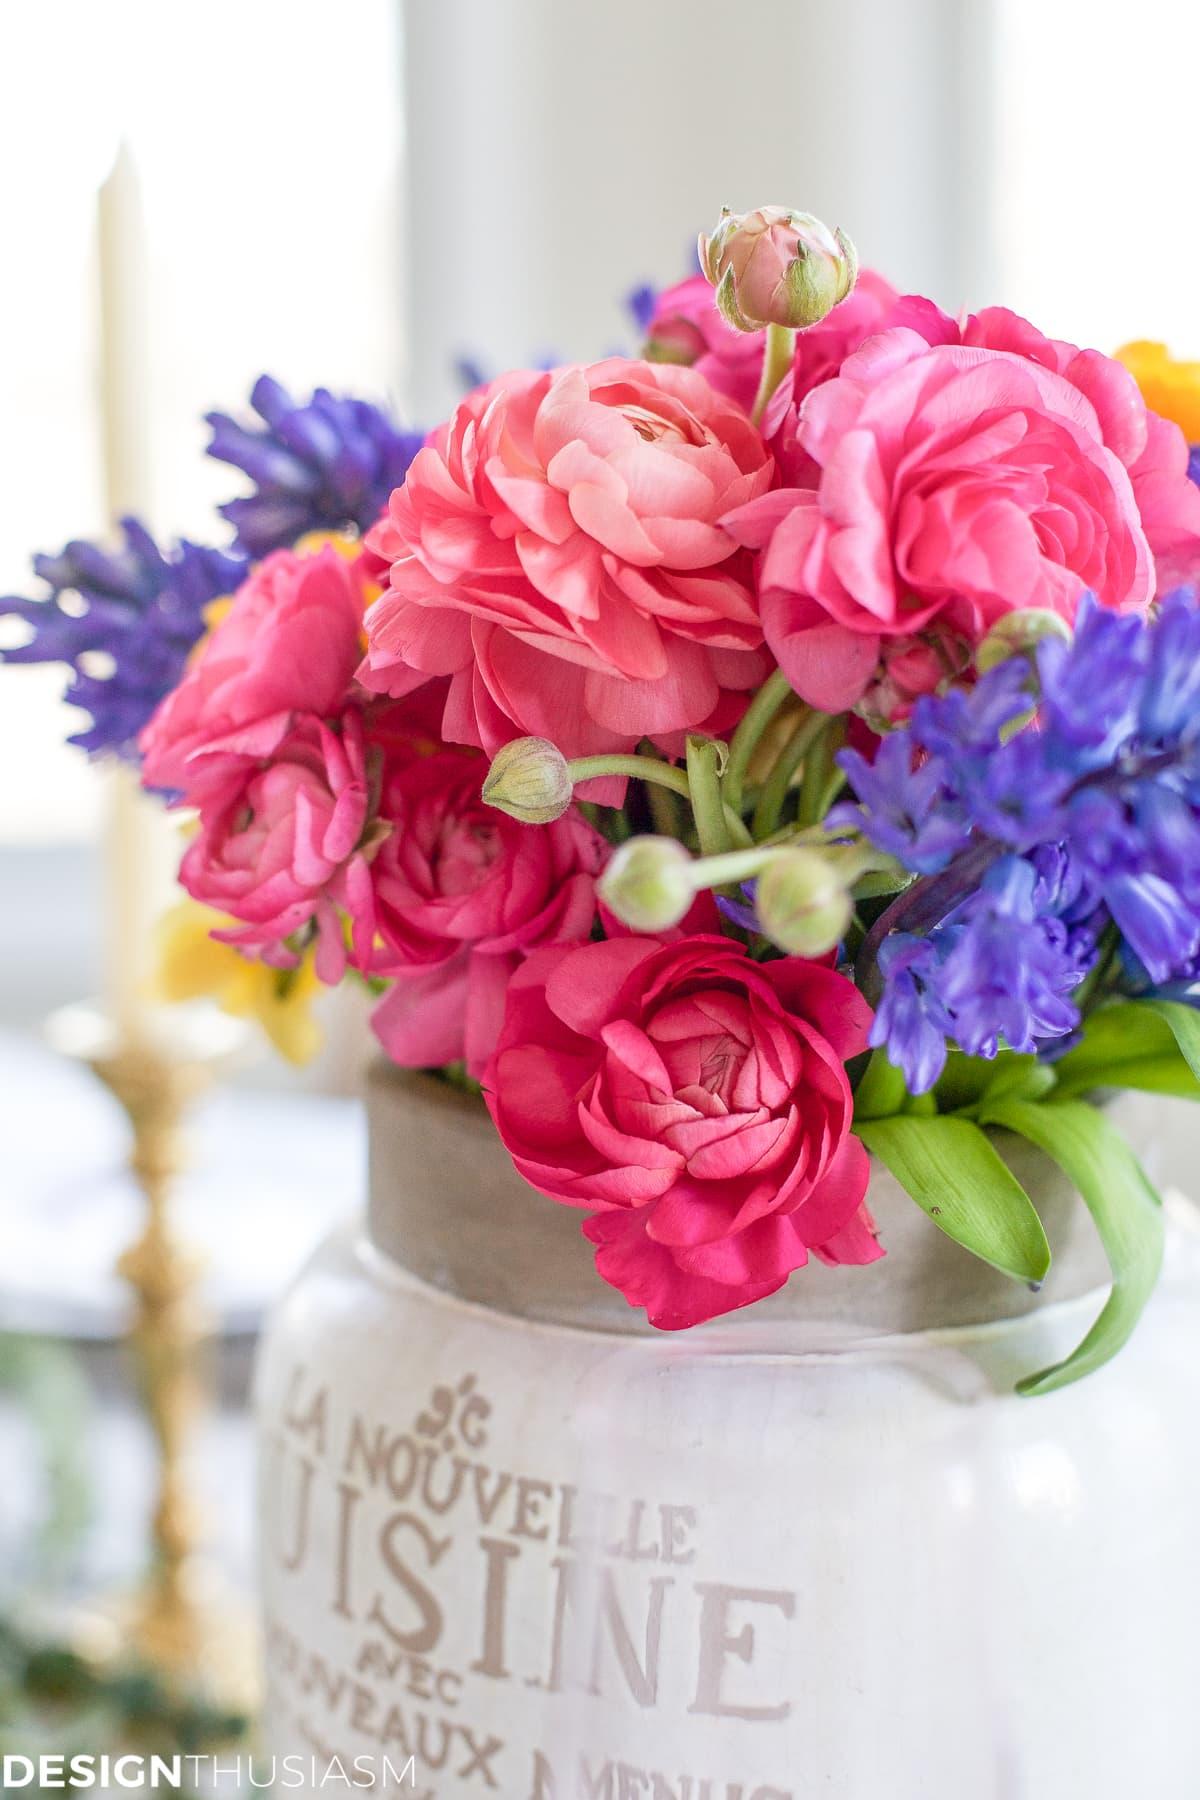 Spring Flower Arrangements Add Color to a Seasonal Tablescape | Designthusiasm.com